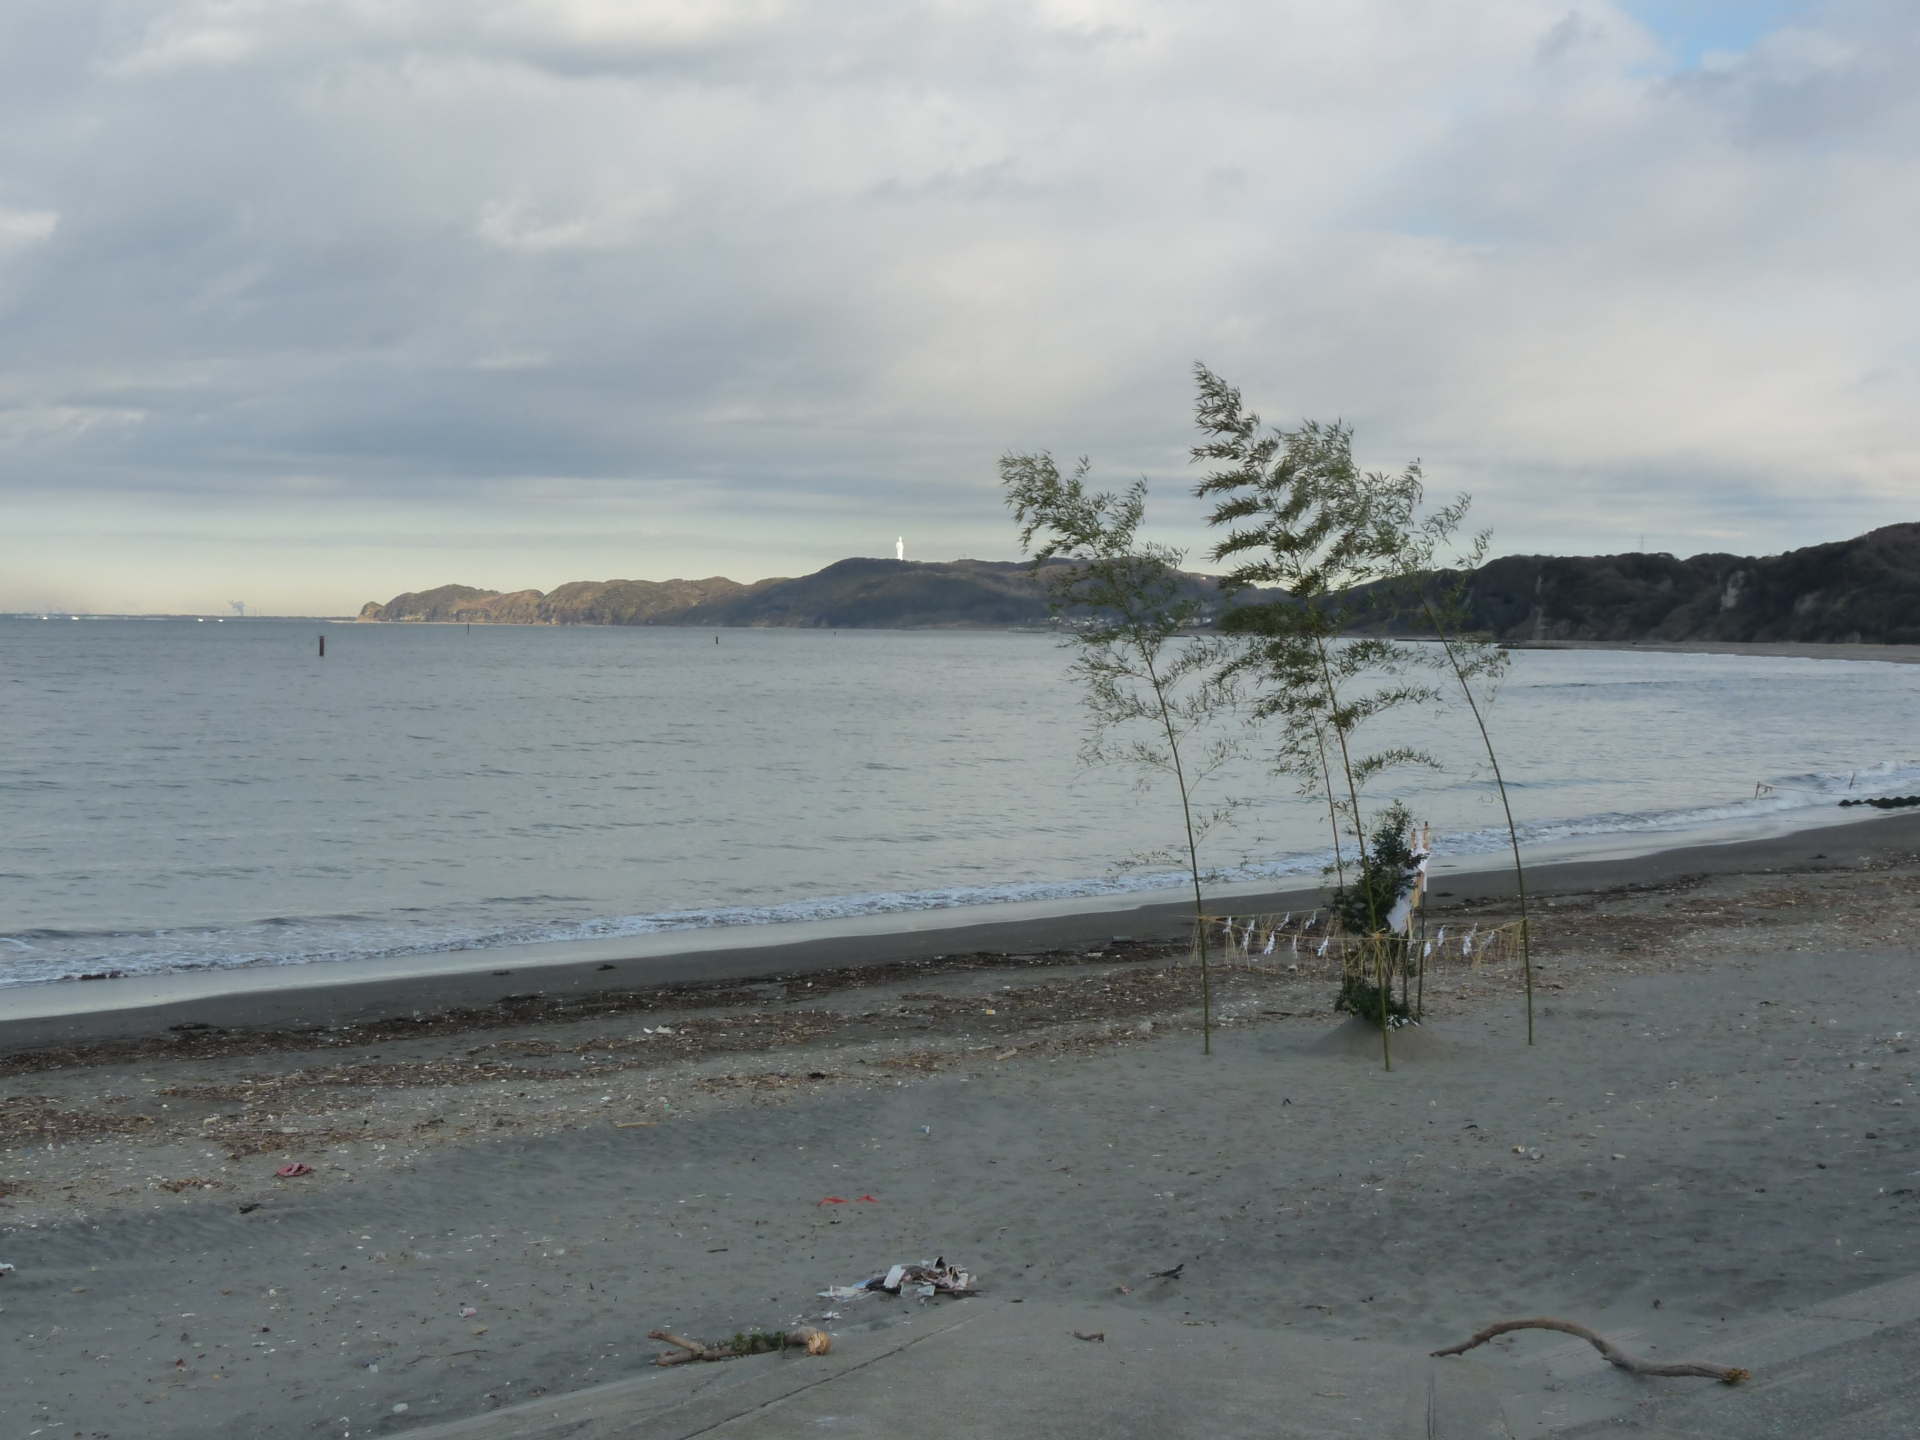 The beach in Kazusa-Minato Chiba , Japan